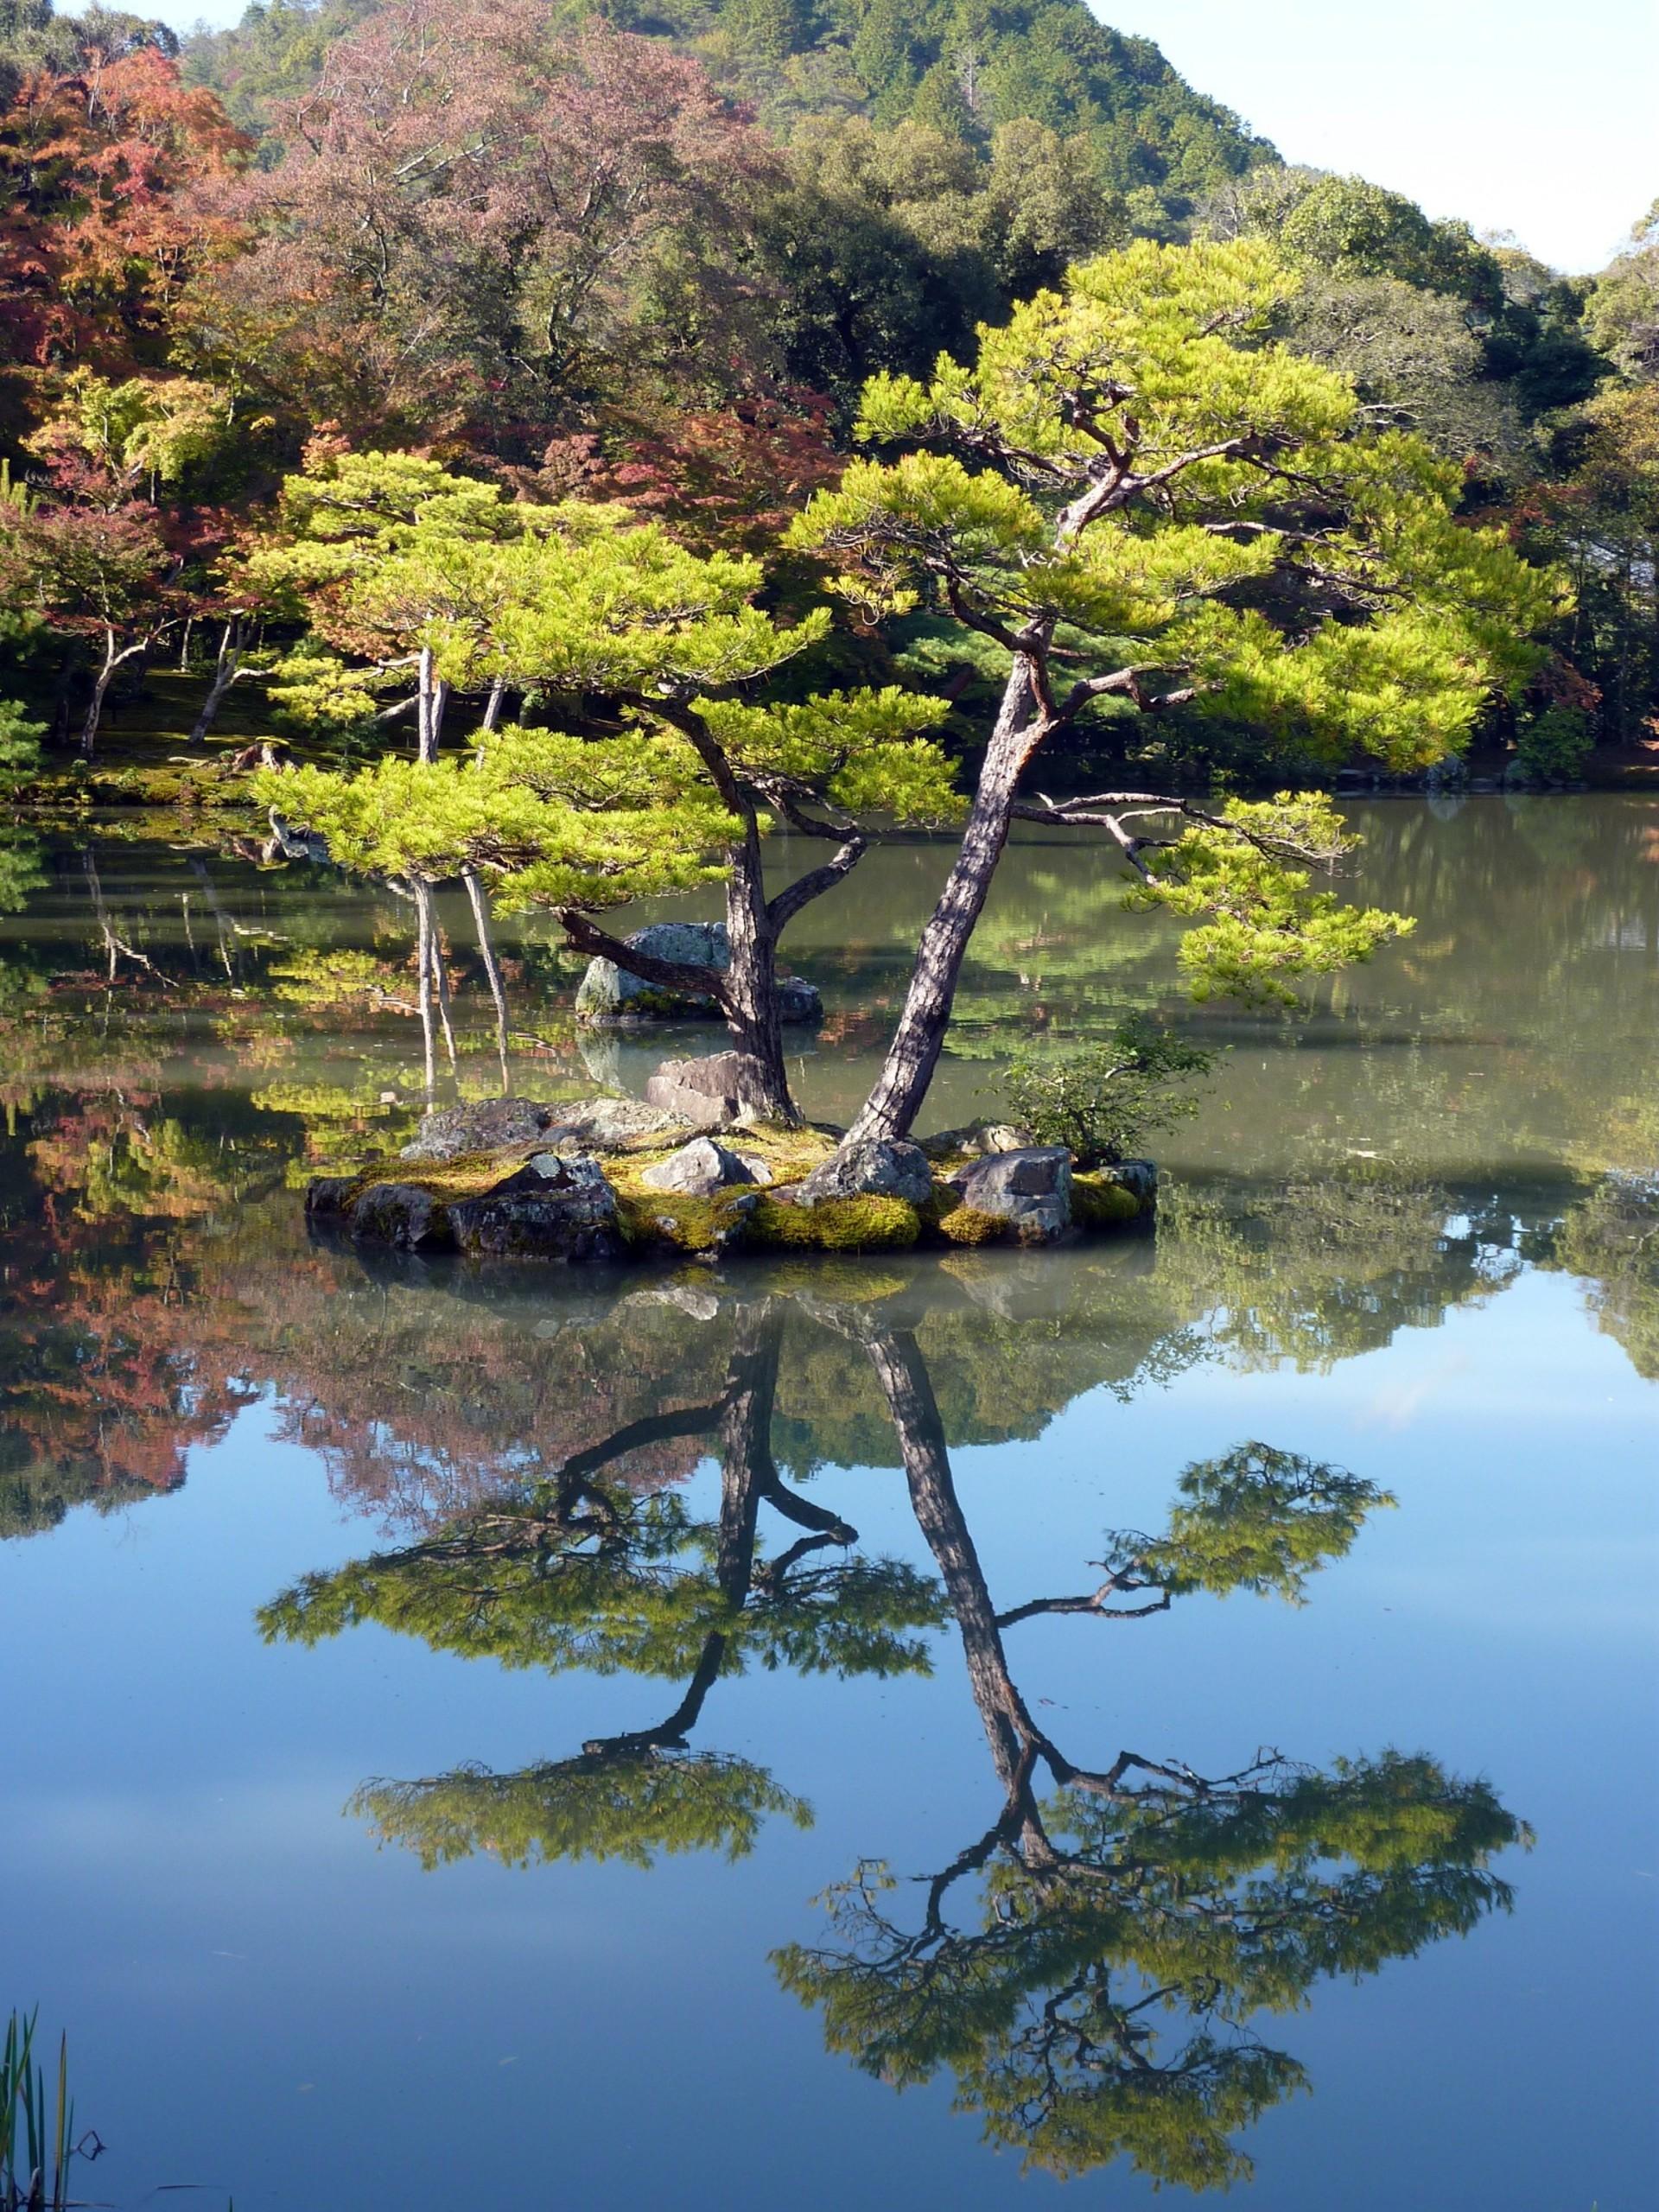 Japanese garden reflections | berbobio, branch, lake, landscape